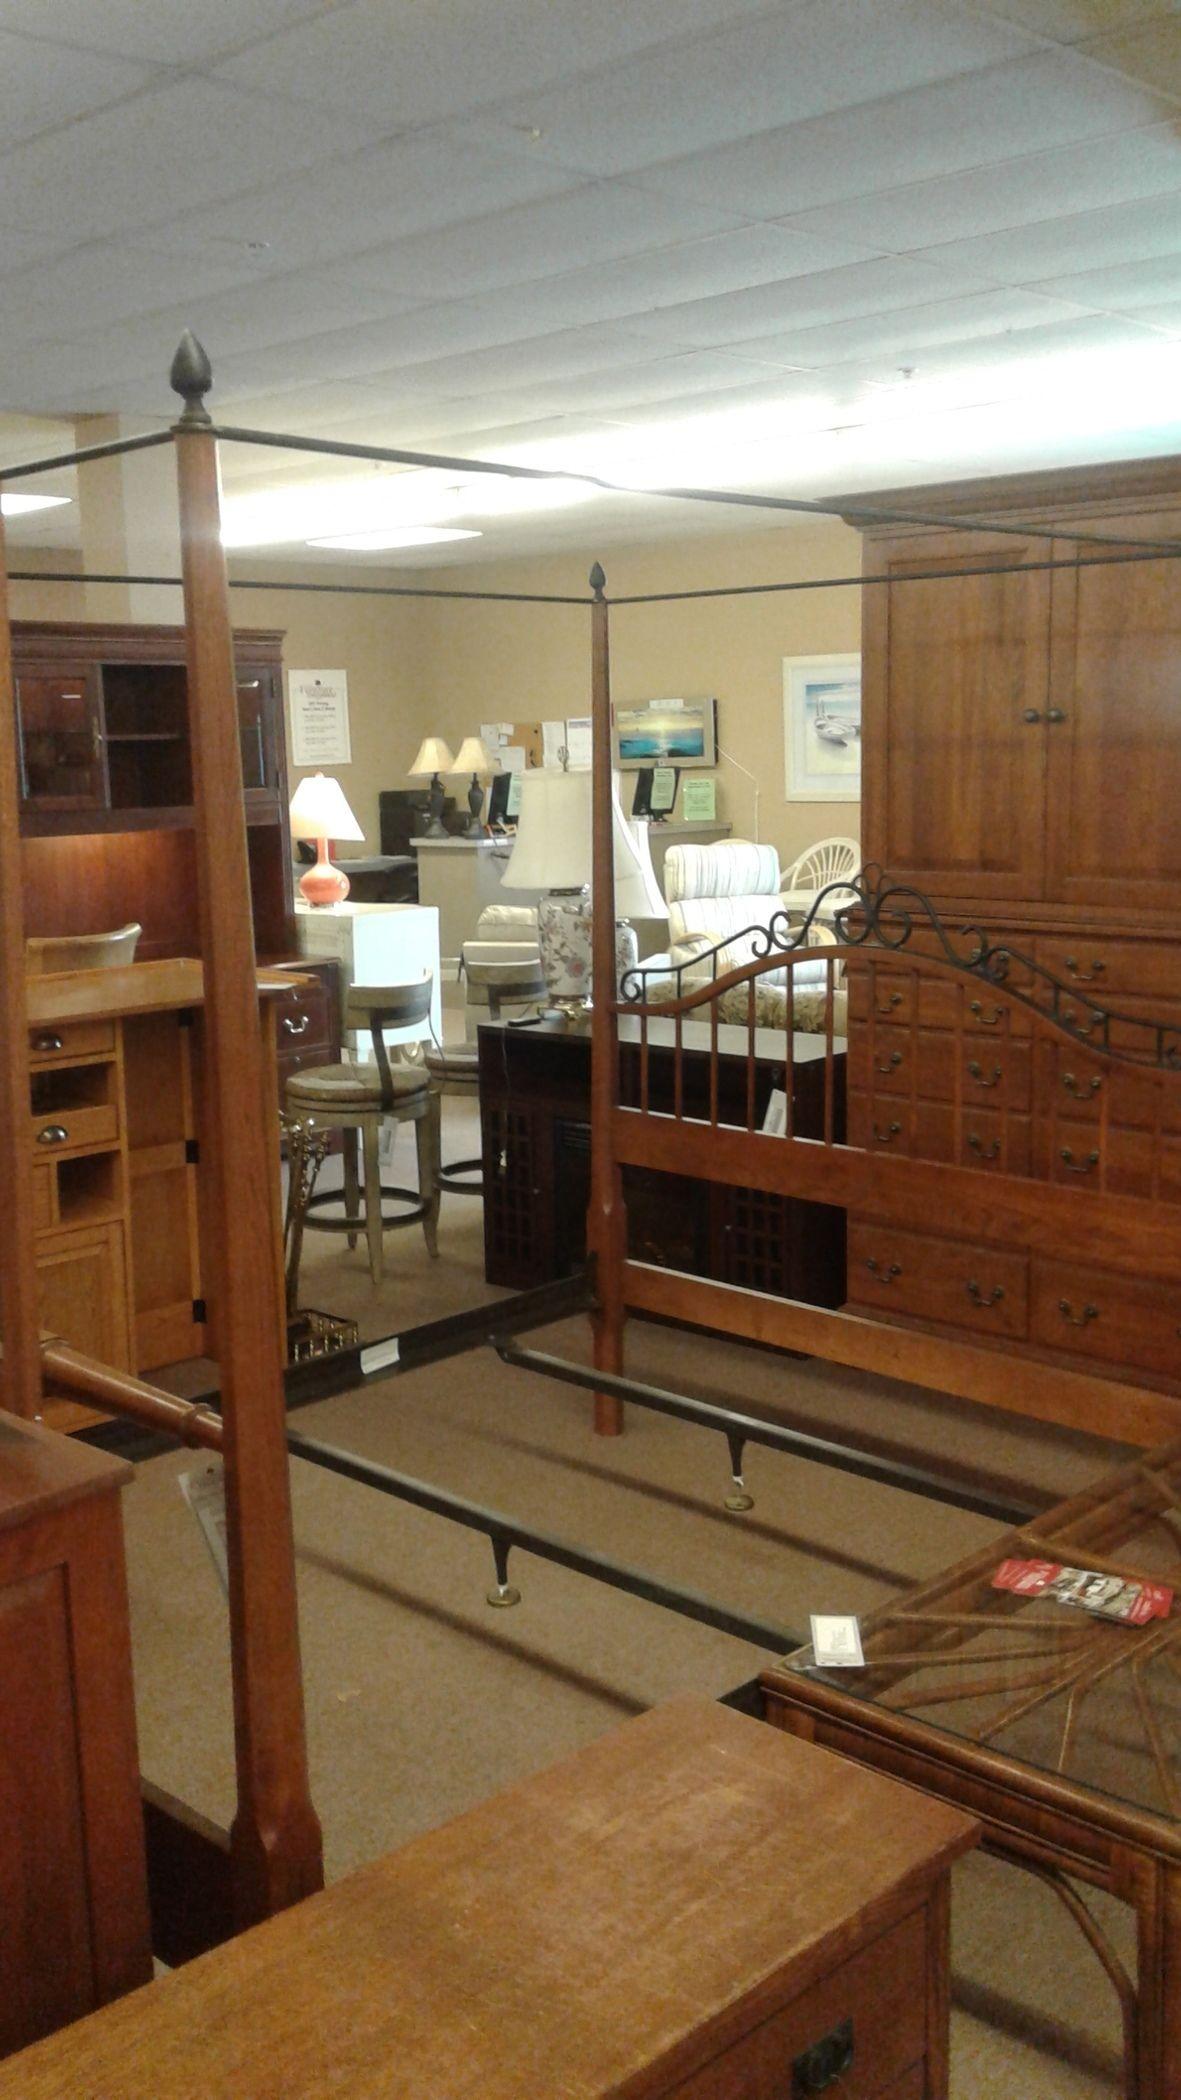 Keller Oak Queen Canopy Bed Delmarva Furniture Consignment